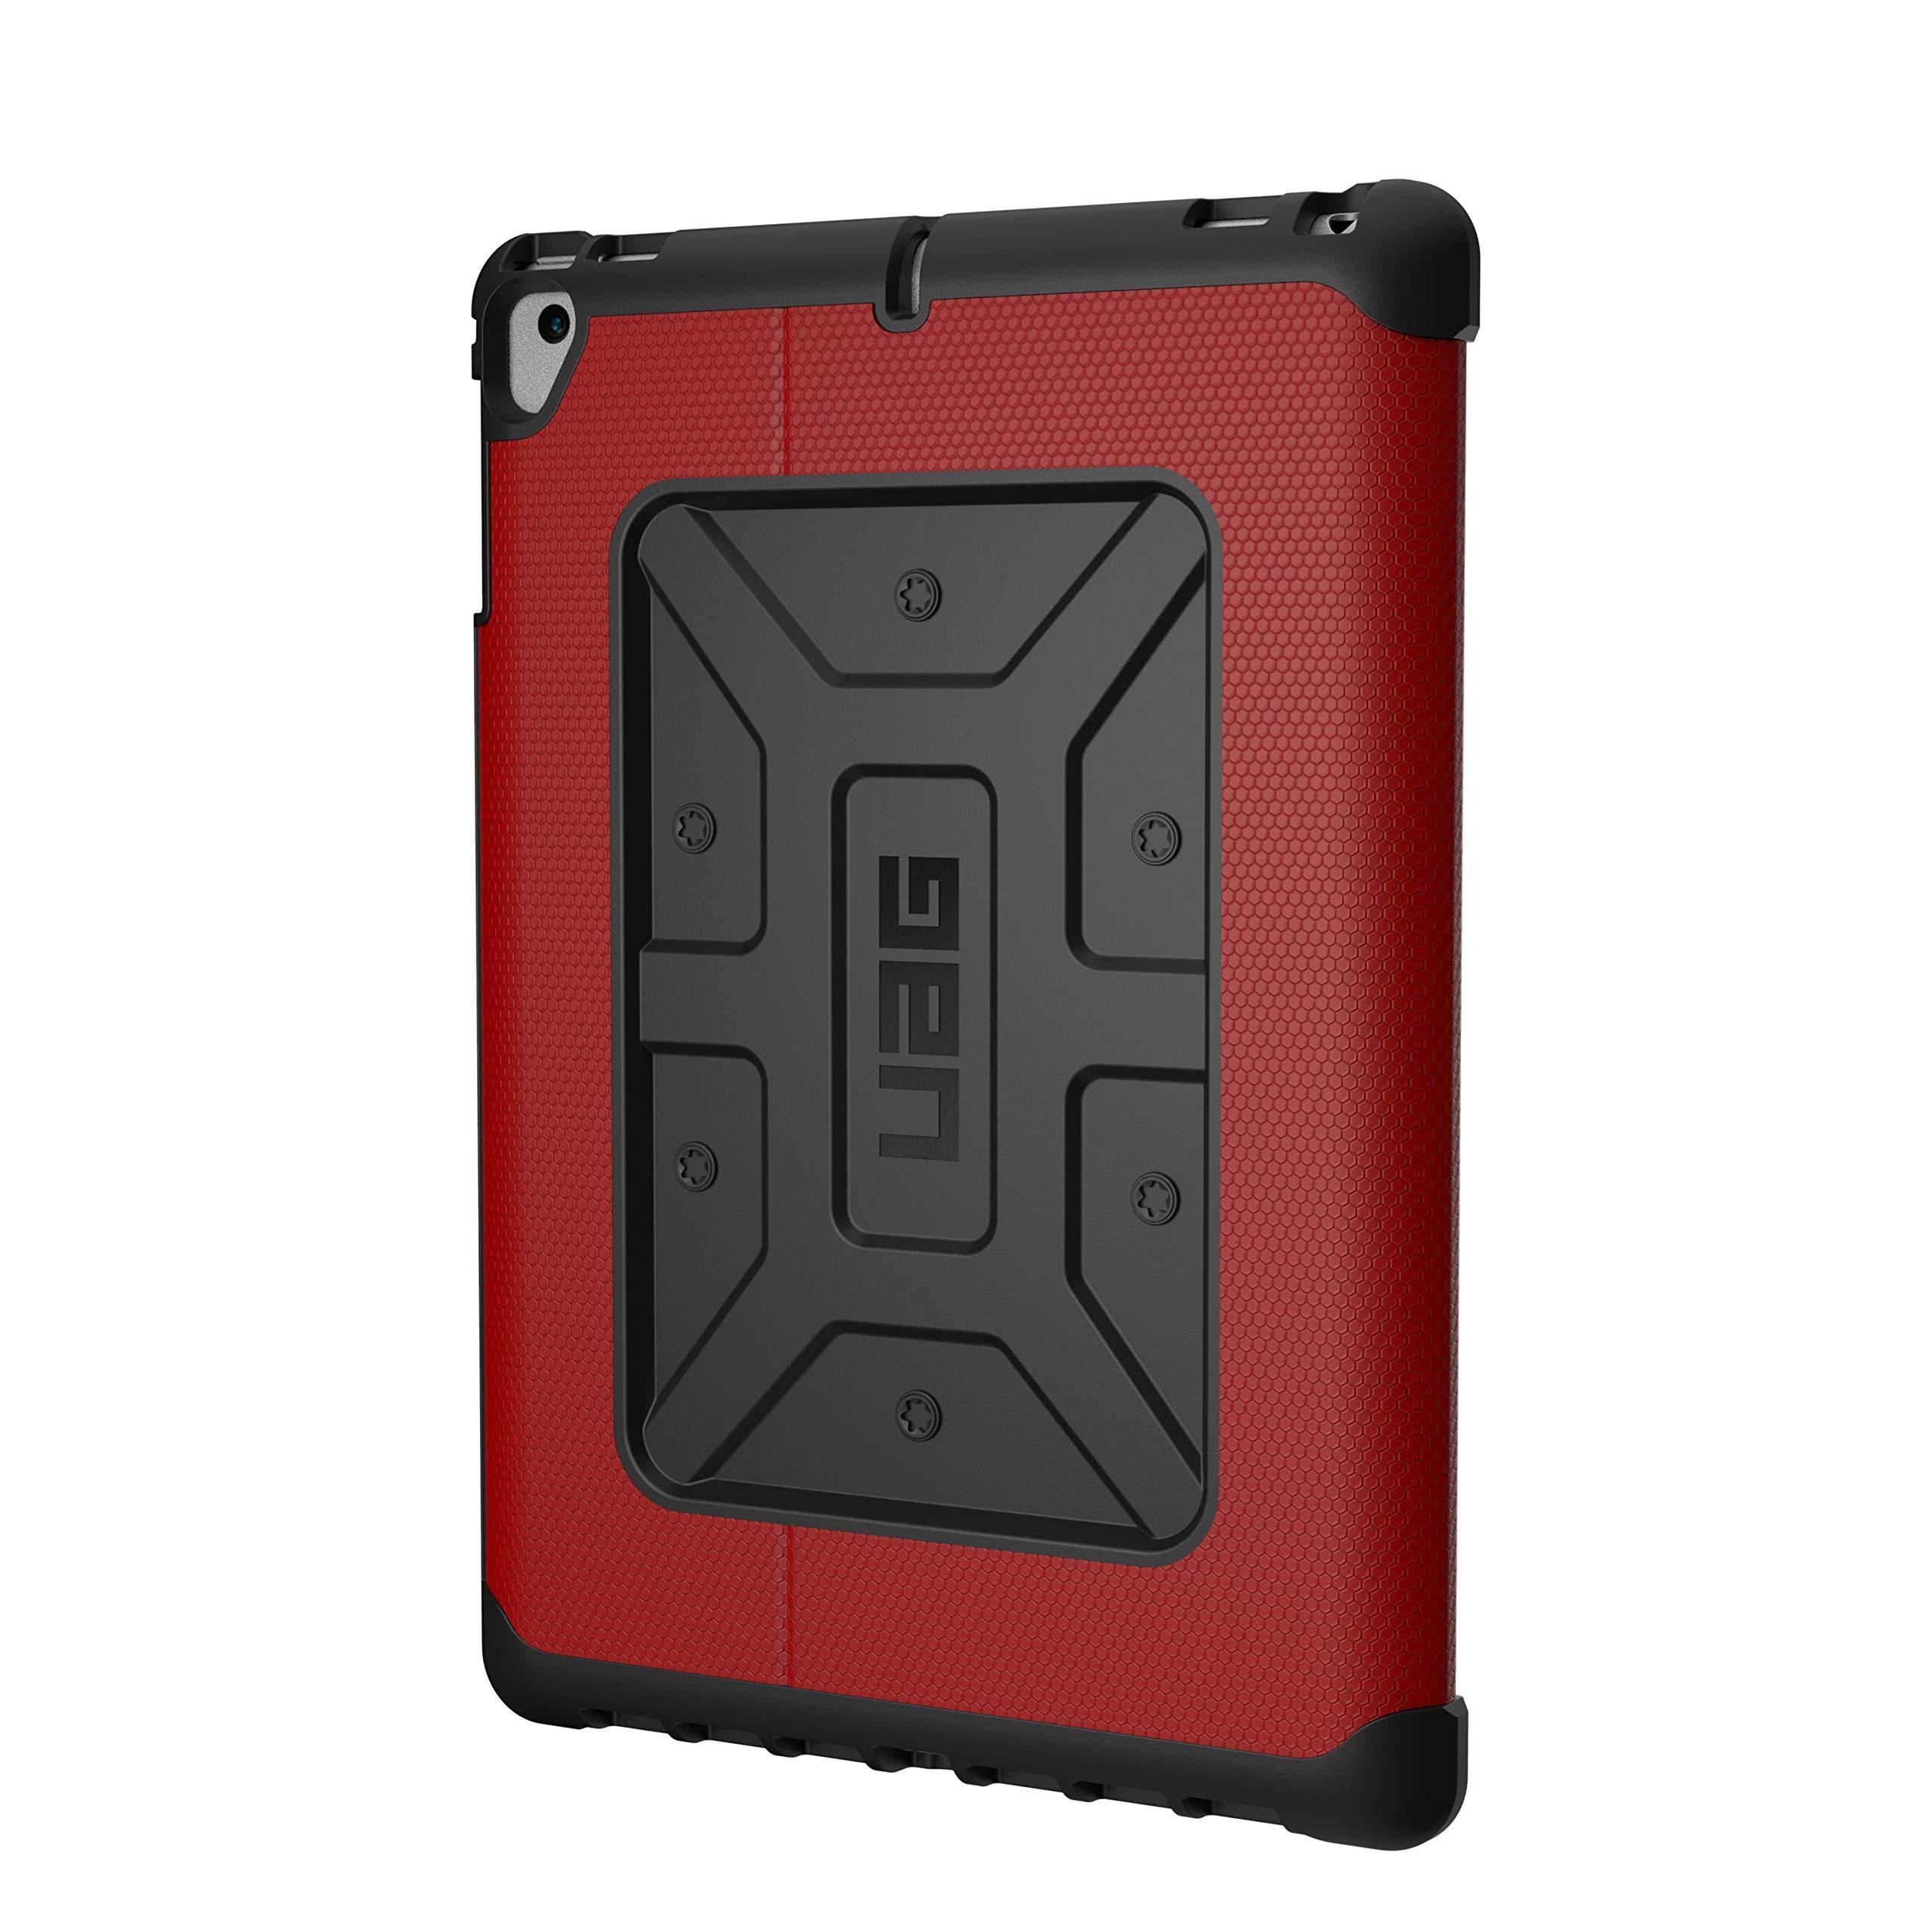 URBAN ARMOR GEAR UAG Folio iPad 9.7 (2017 5th Gen & 2018 6th Gen), iPad Pro 9.7, iPad Air 1/Air 2 Metropolis Feather-Light Rugged [Magma] Military Drop Tested iPad Case